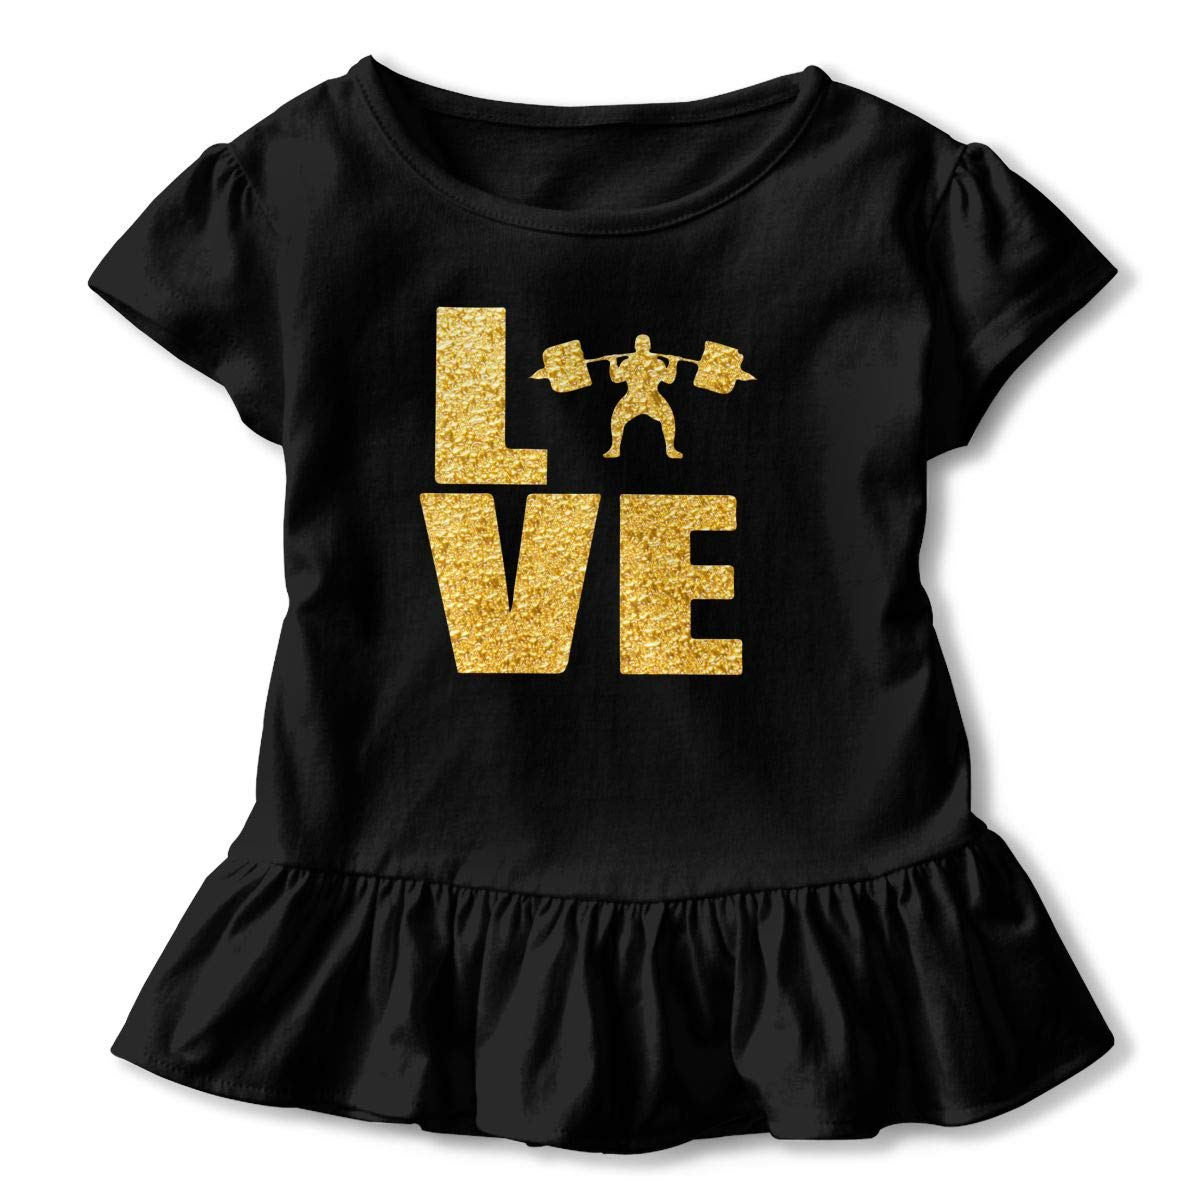 Love Weightlifting Gold Weightlifting Toddler Girls T Shirt Kids Cotton Short Sleeve Ruffle Tee